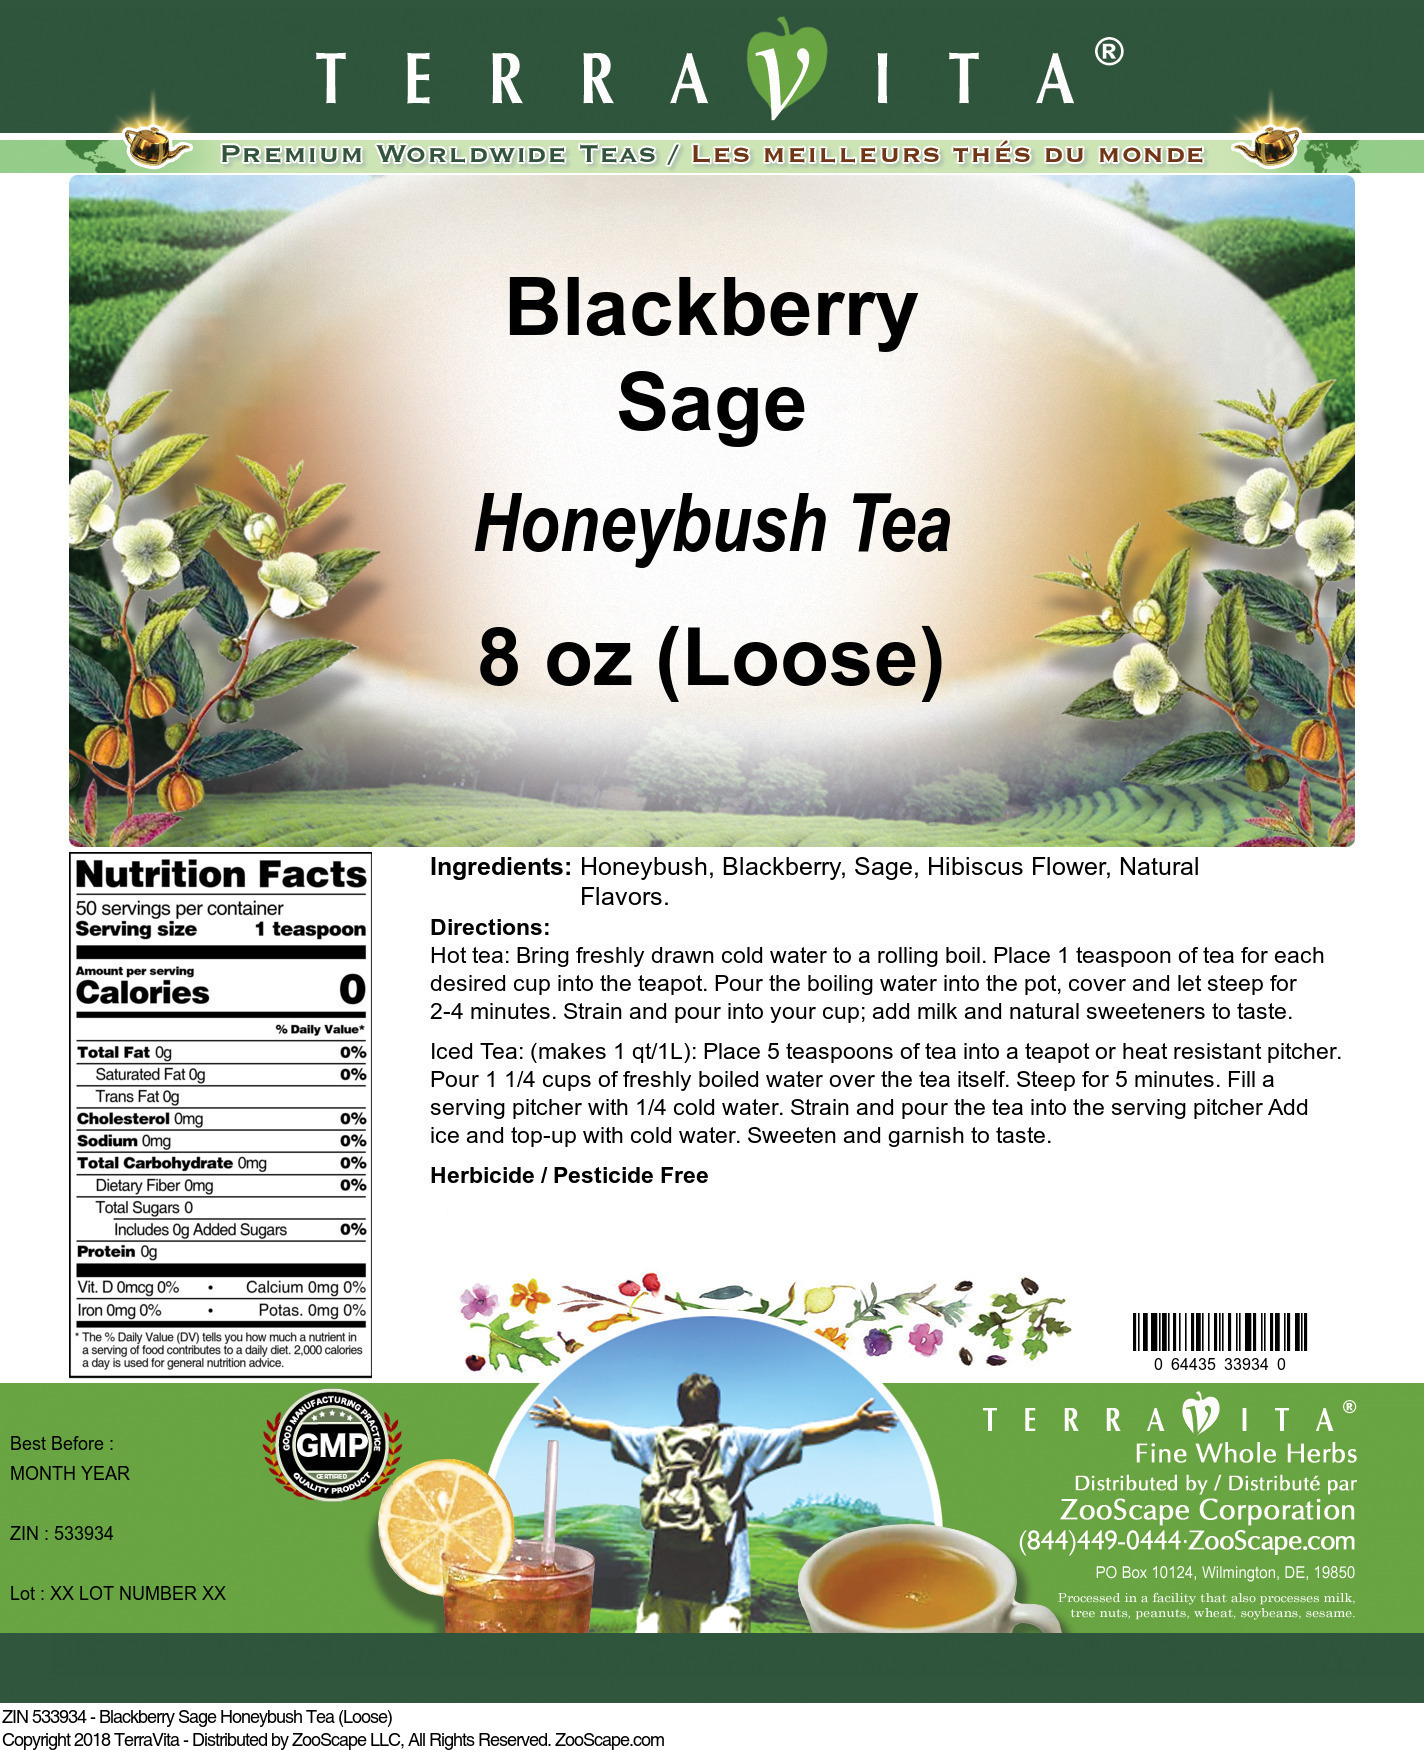 Blackberry Sage Honeybush Tea